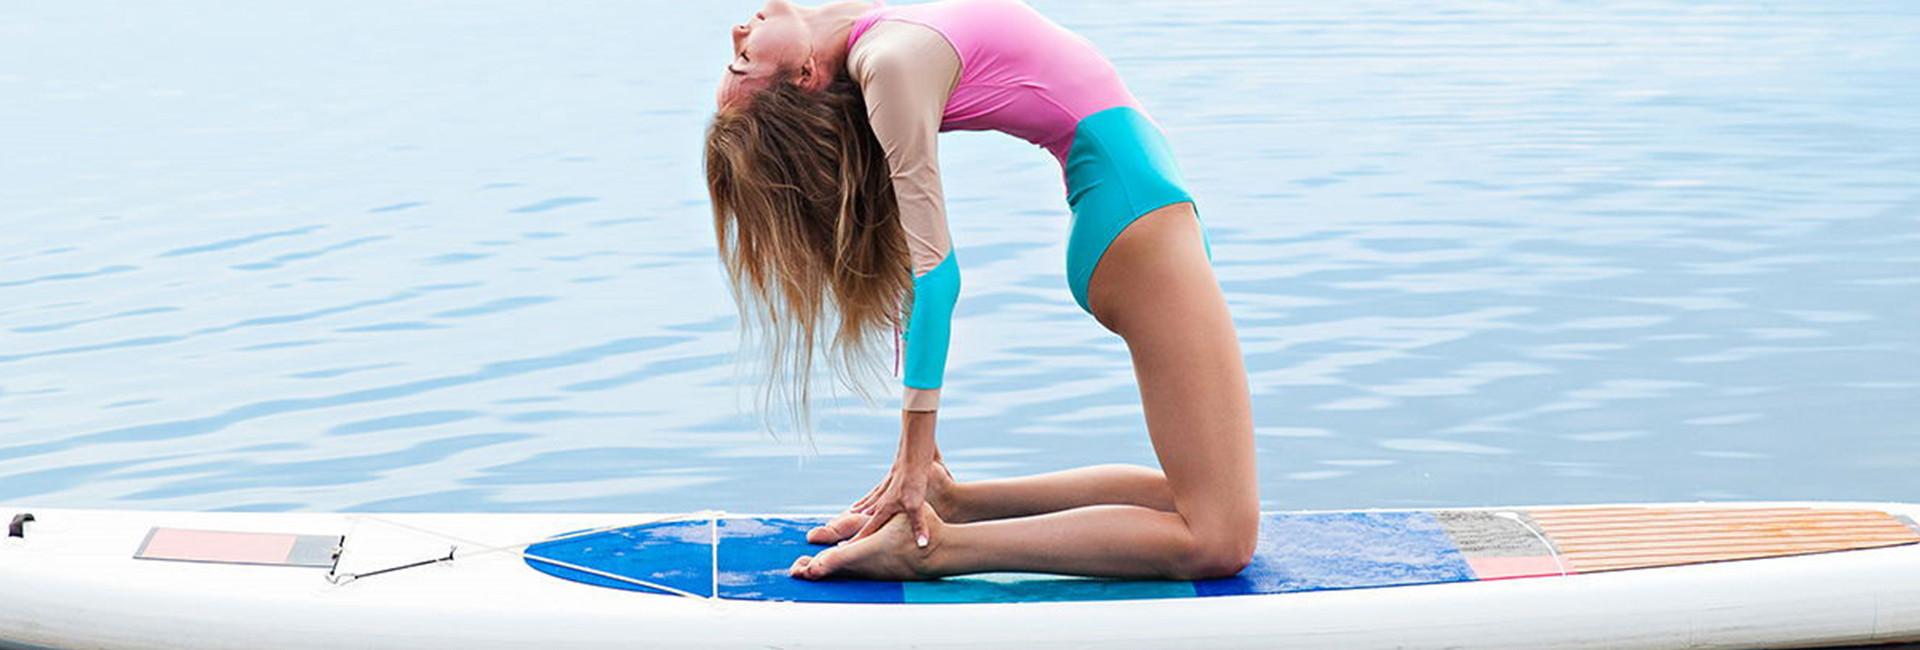 Woman doing yoga on paddle board